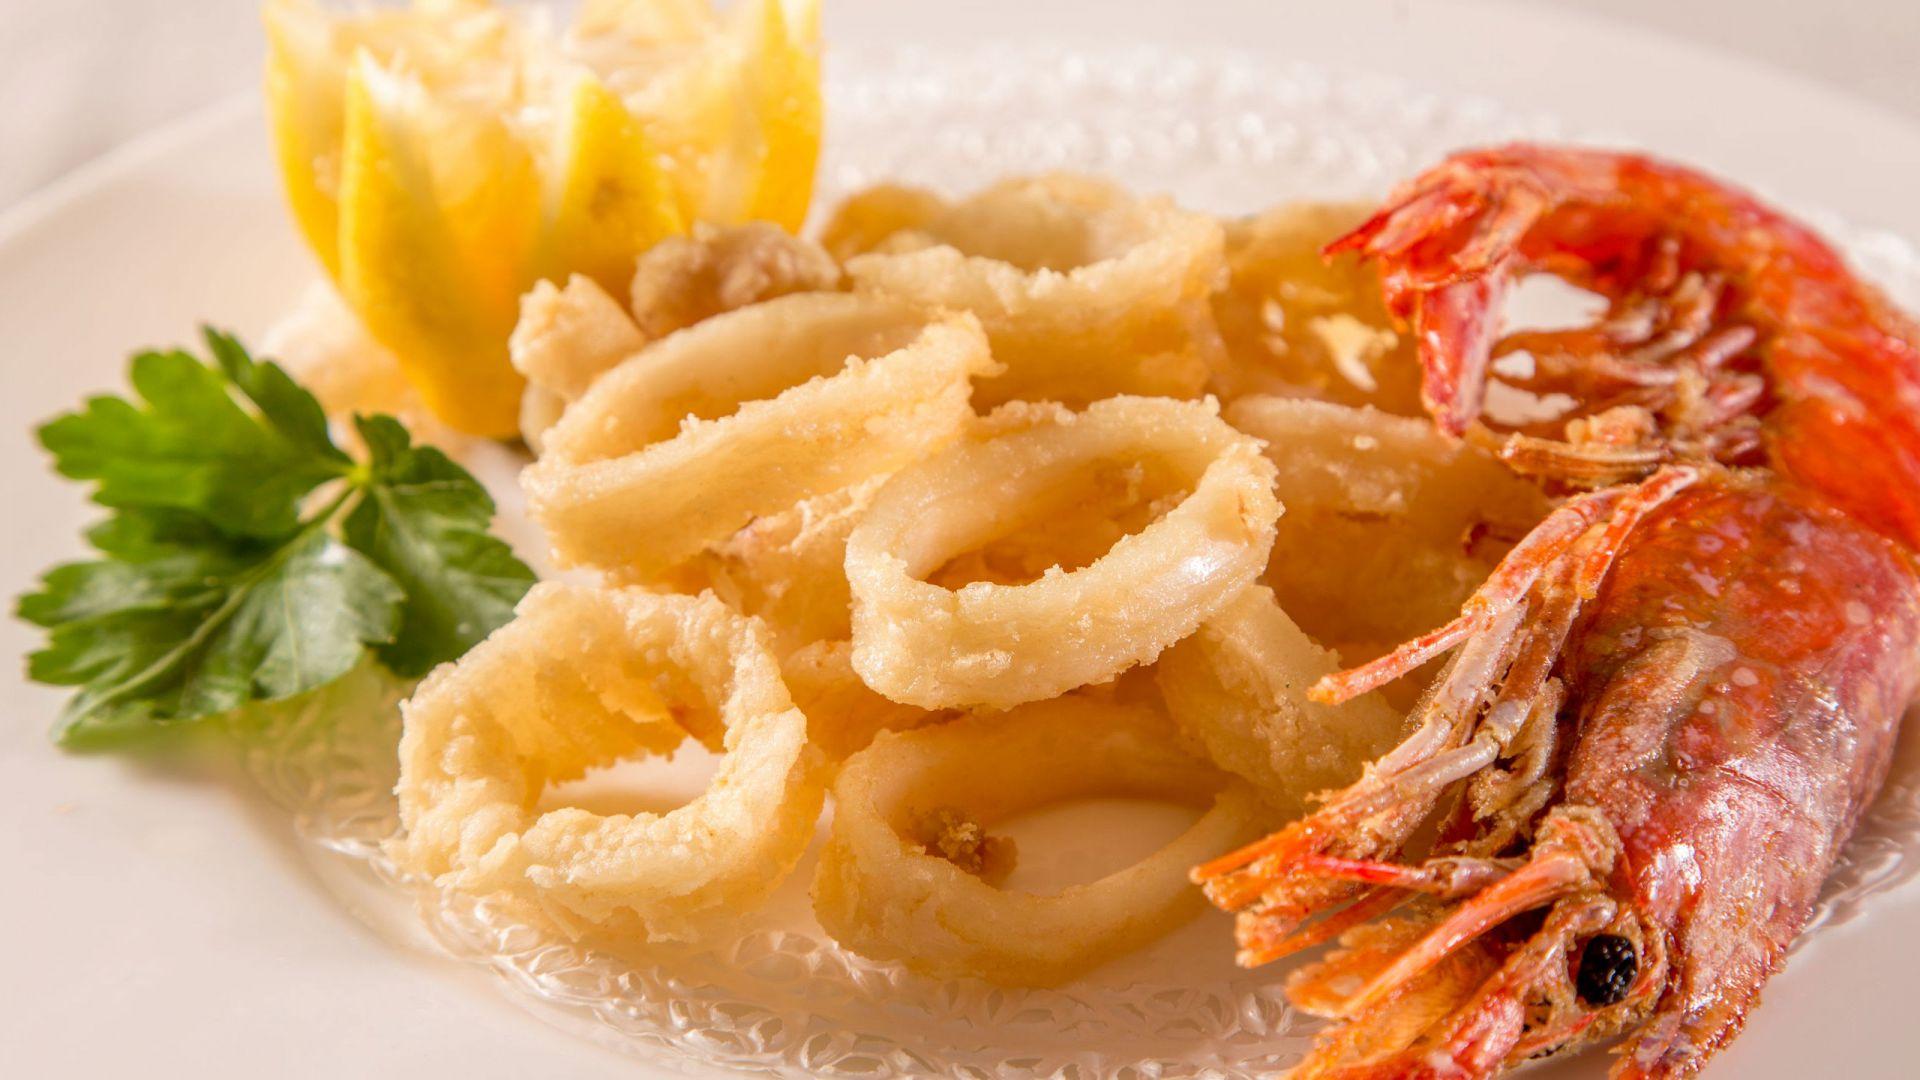 albergo-ottocento-rome-food-07